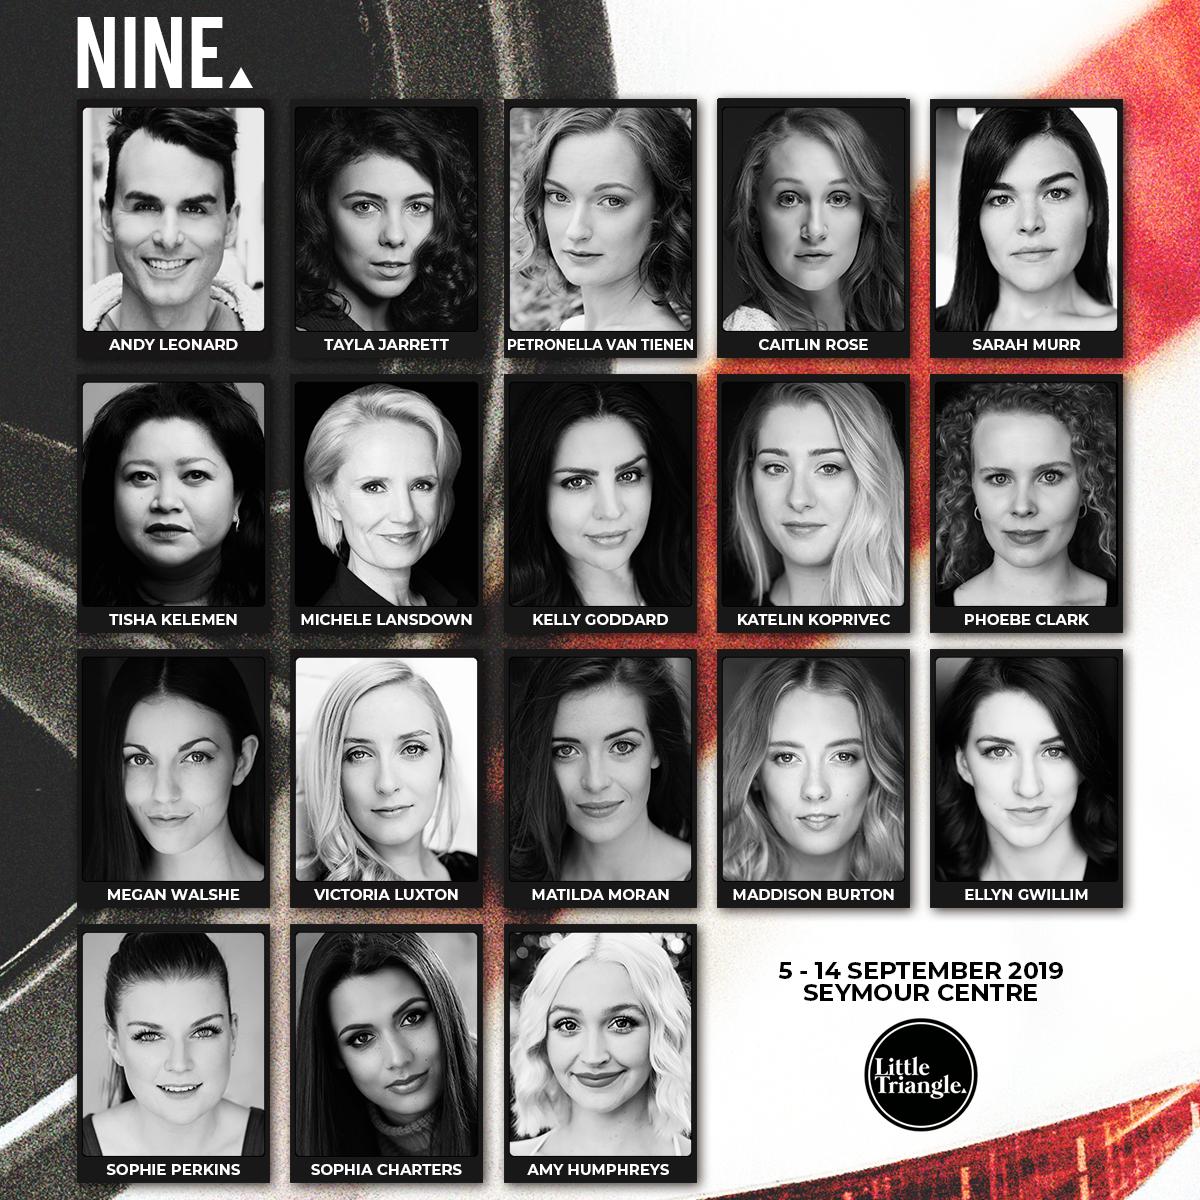 NINE Cast